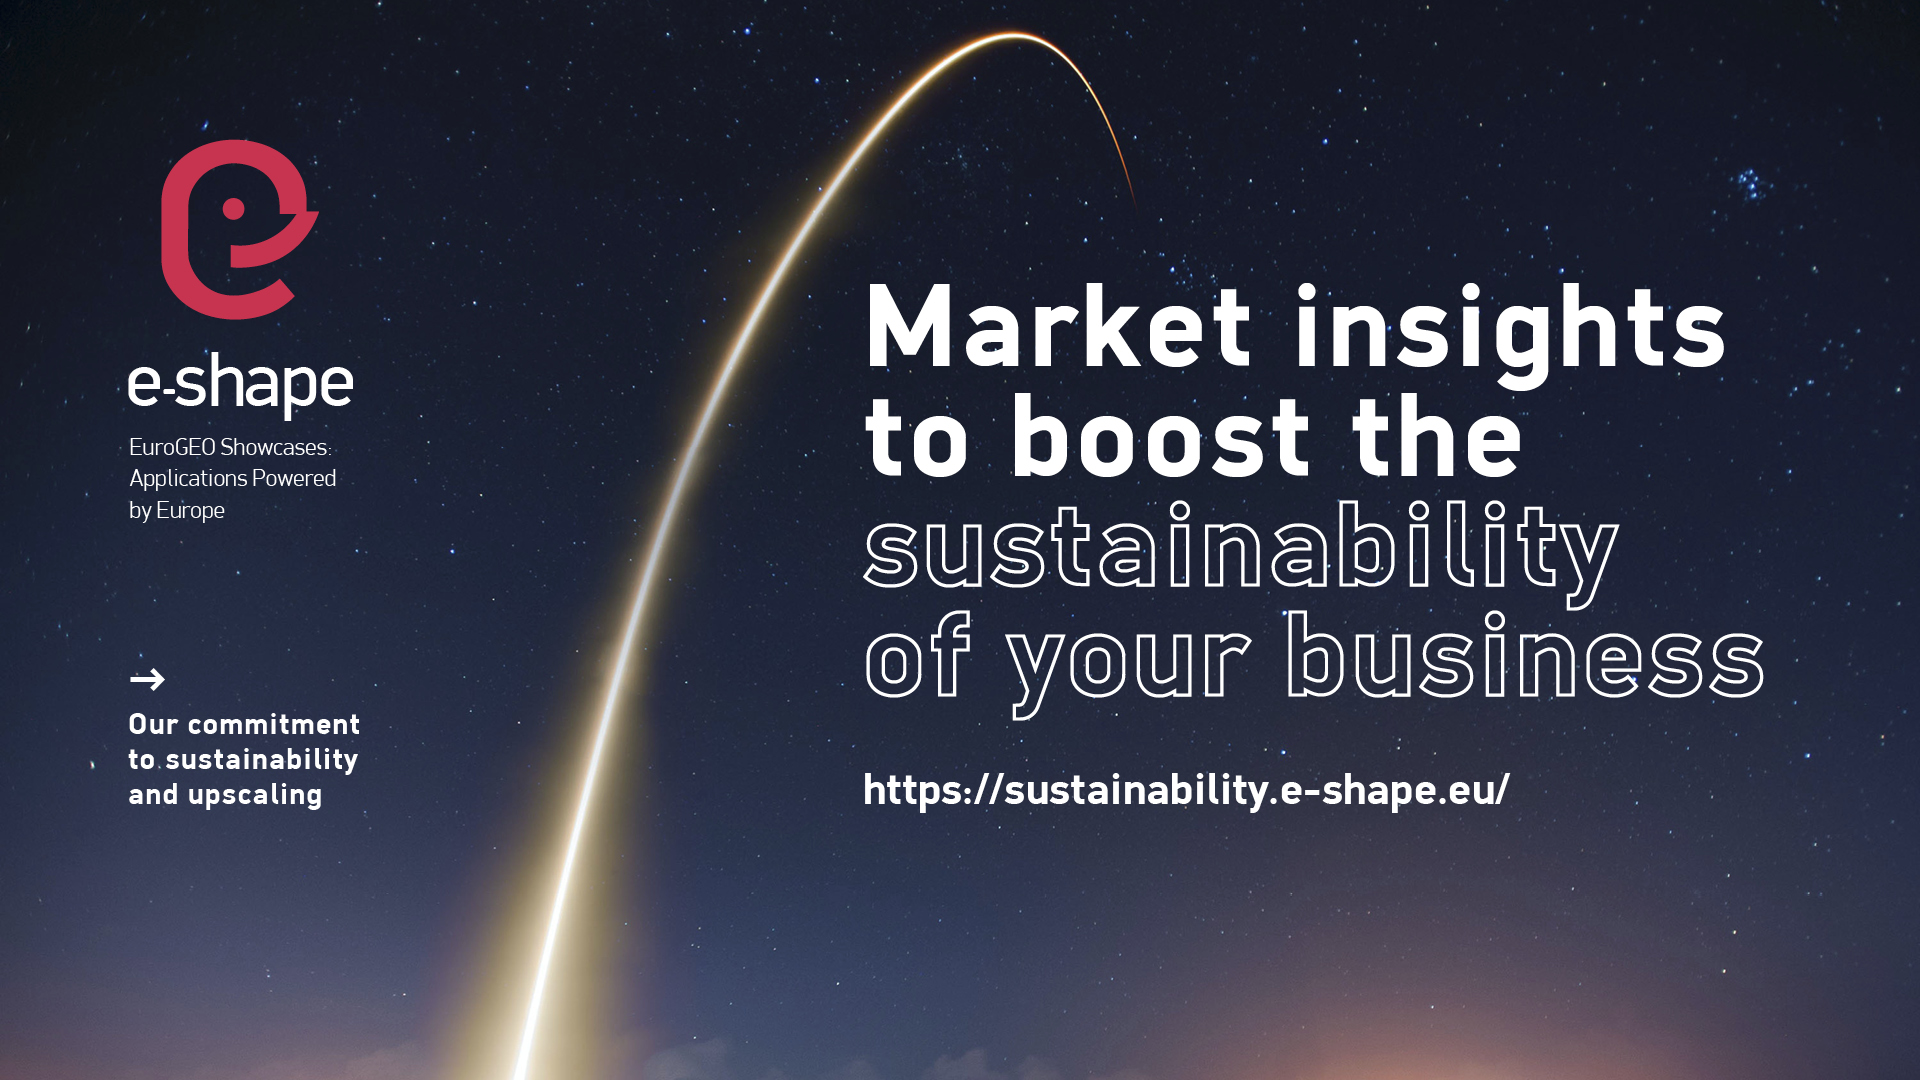 BANNER_Market_insights_1920x1080px